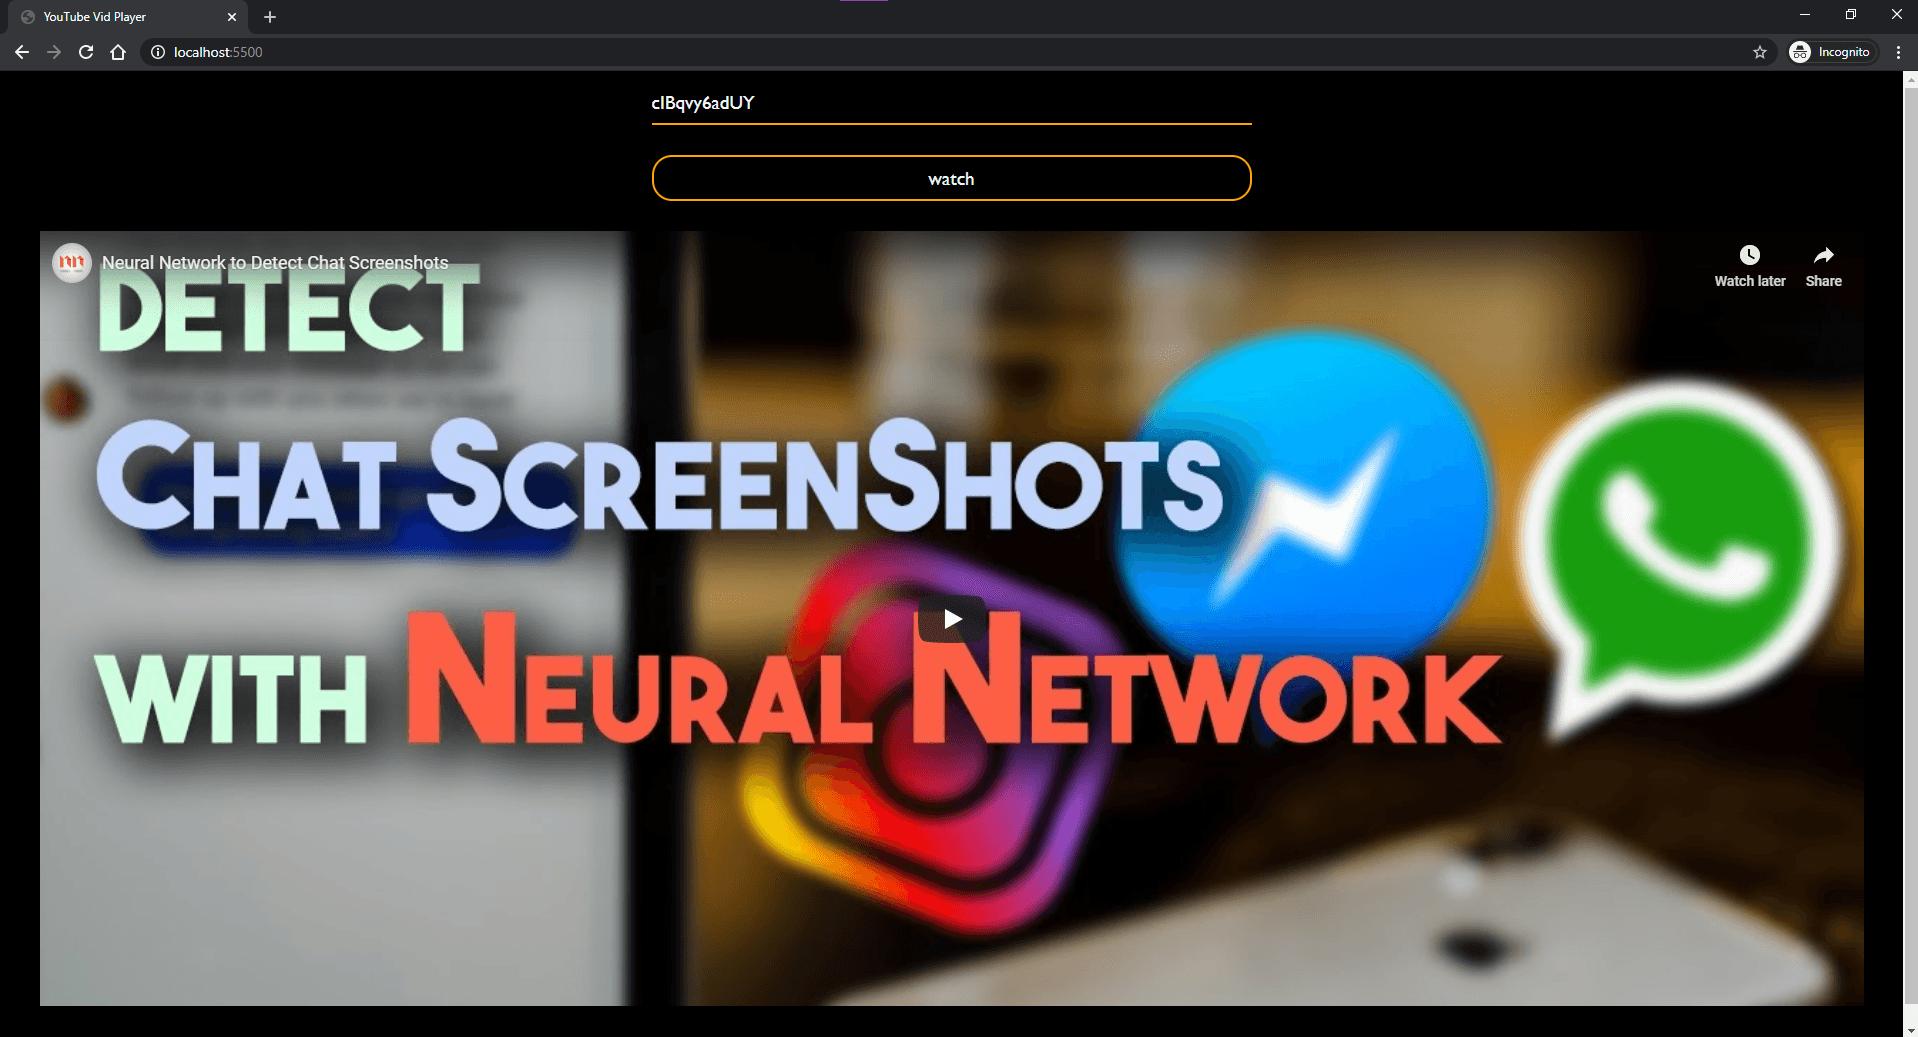 Look of the app